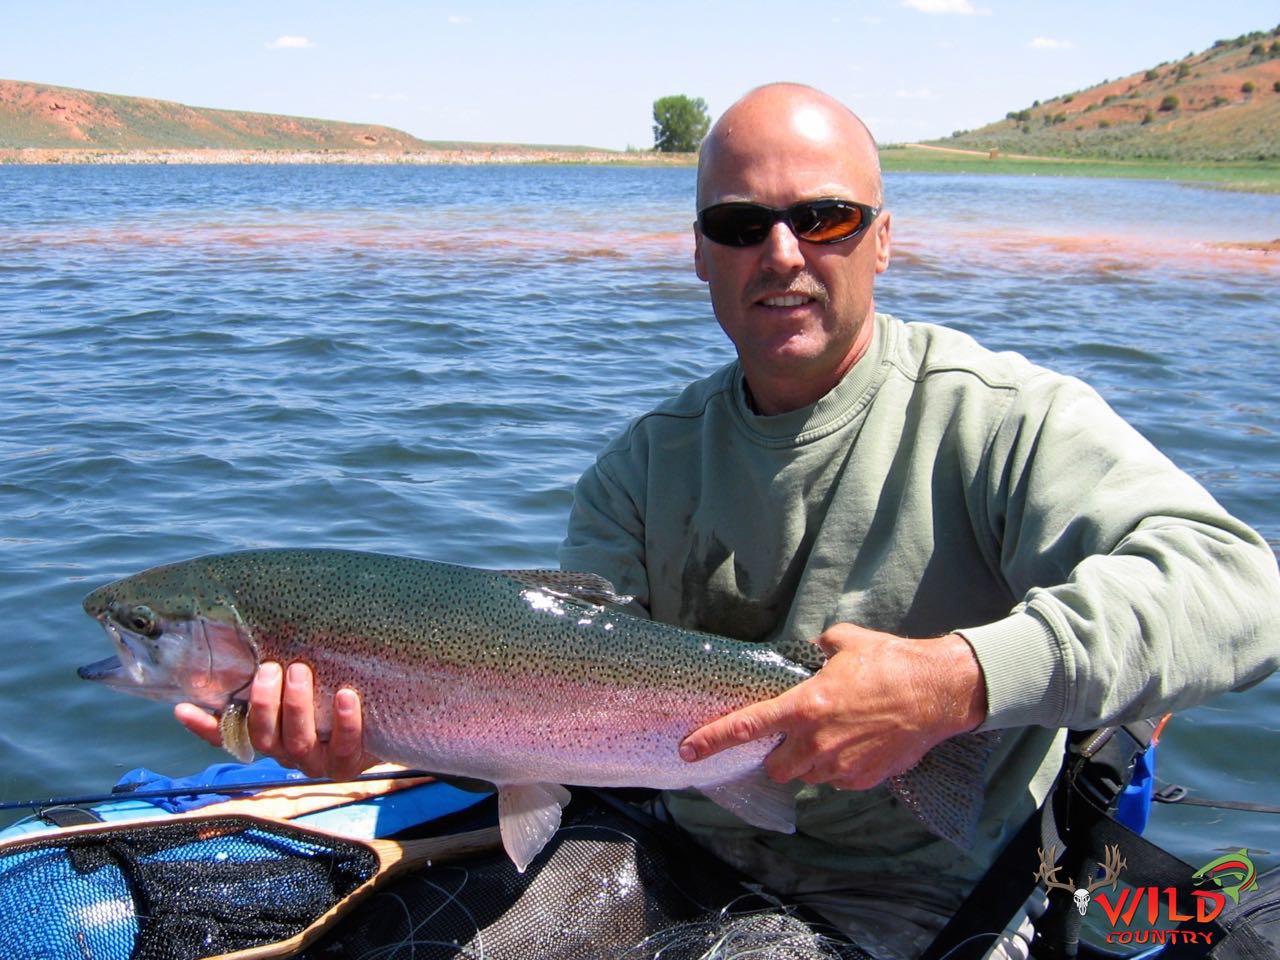 fly fishing utah rainbow trout - 2.jpg